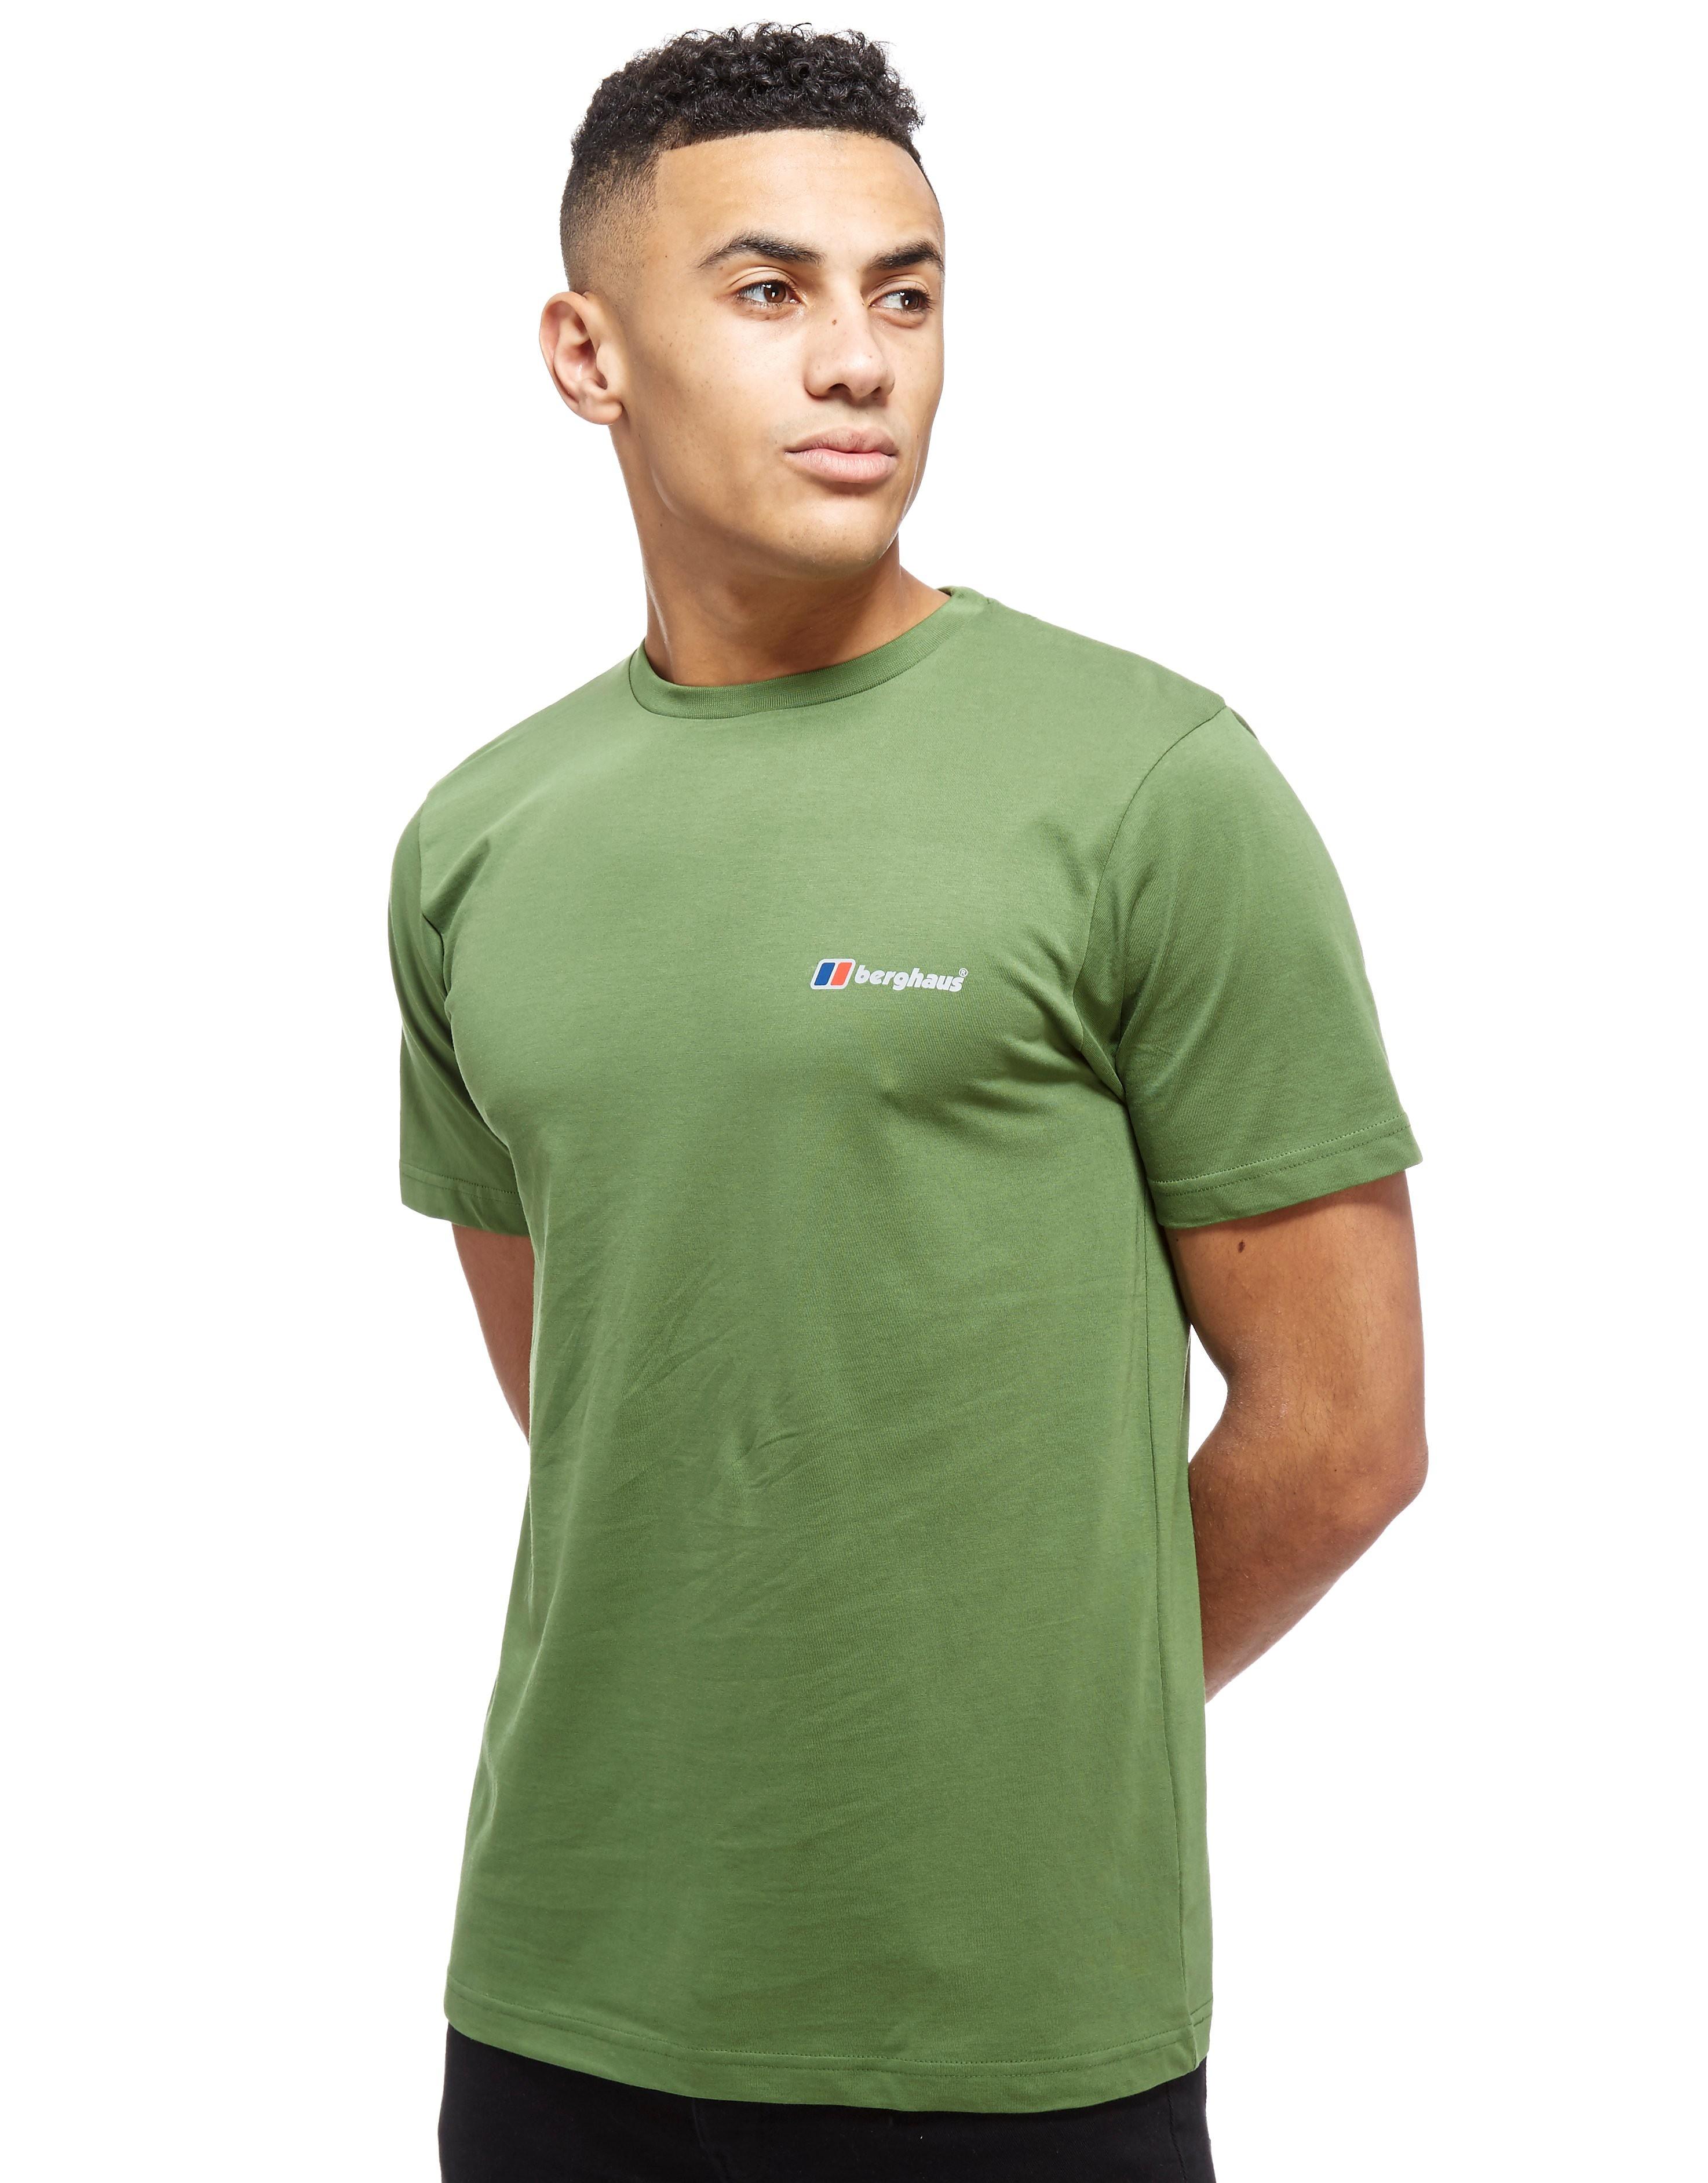 Berghaus Block Logo T-Shirt